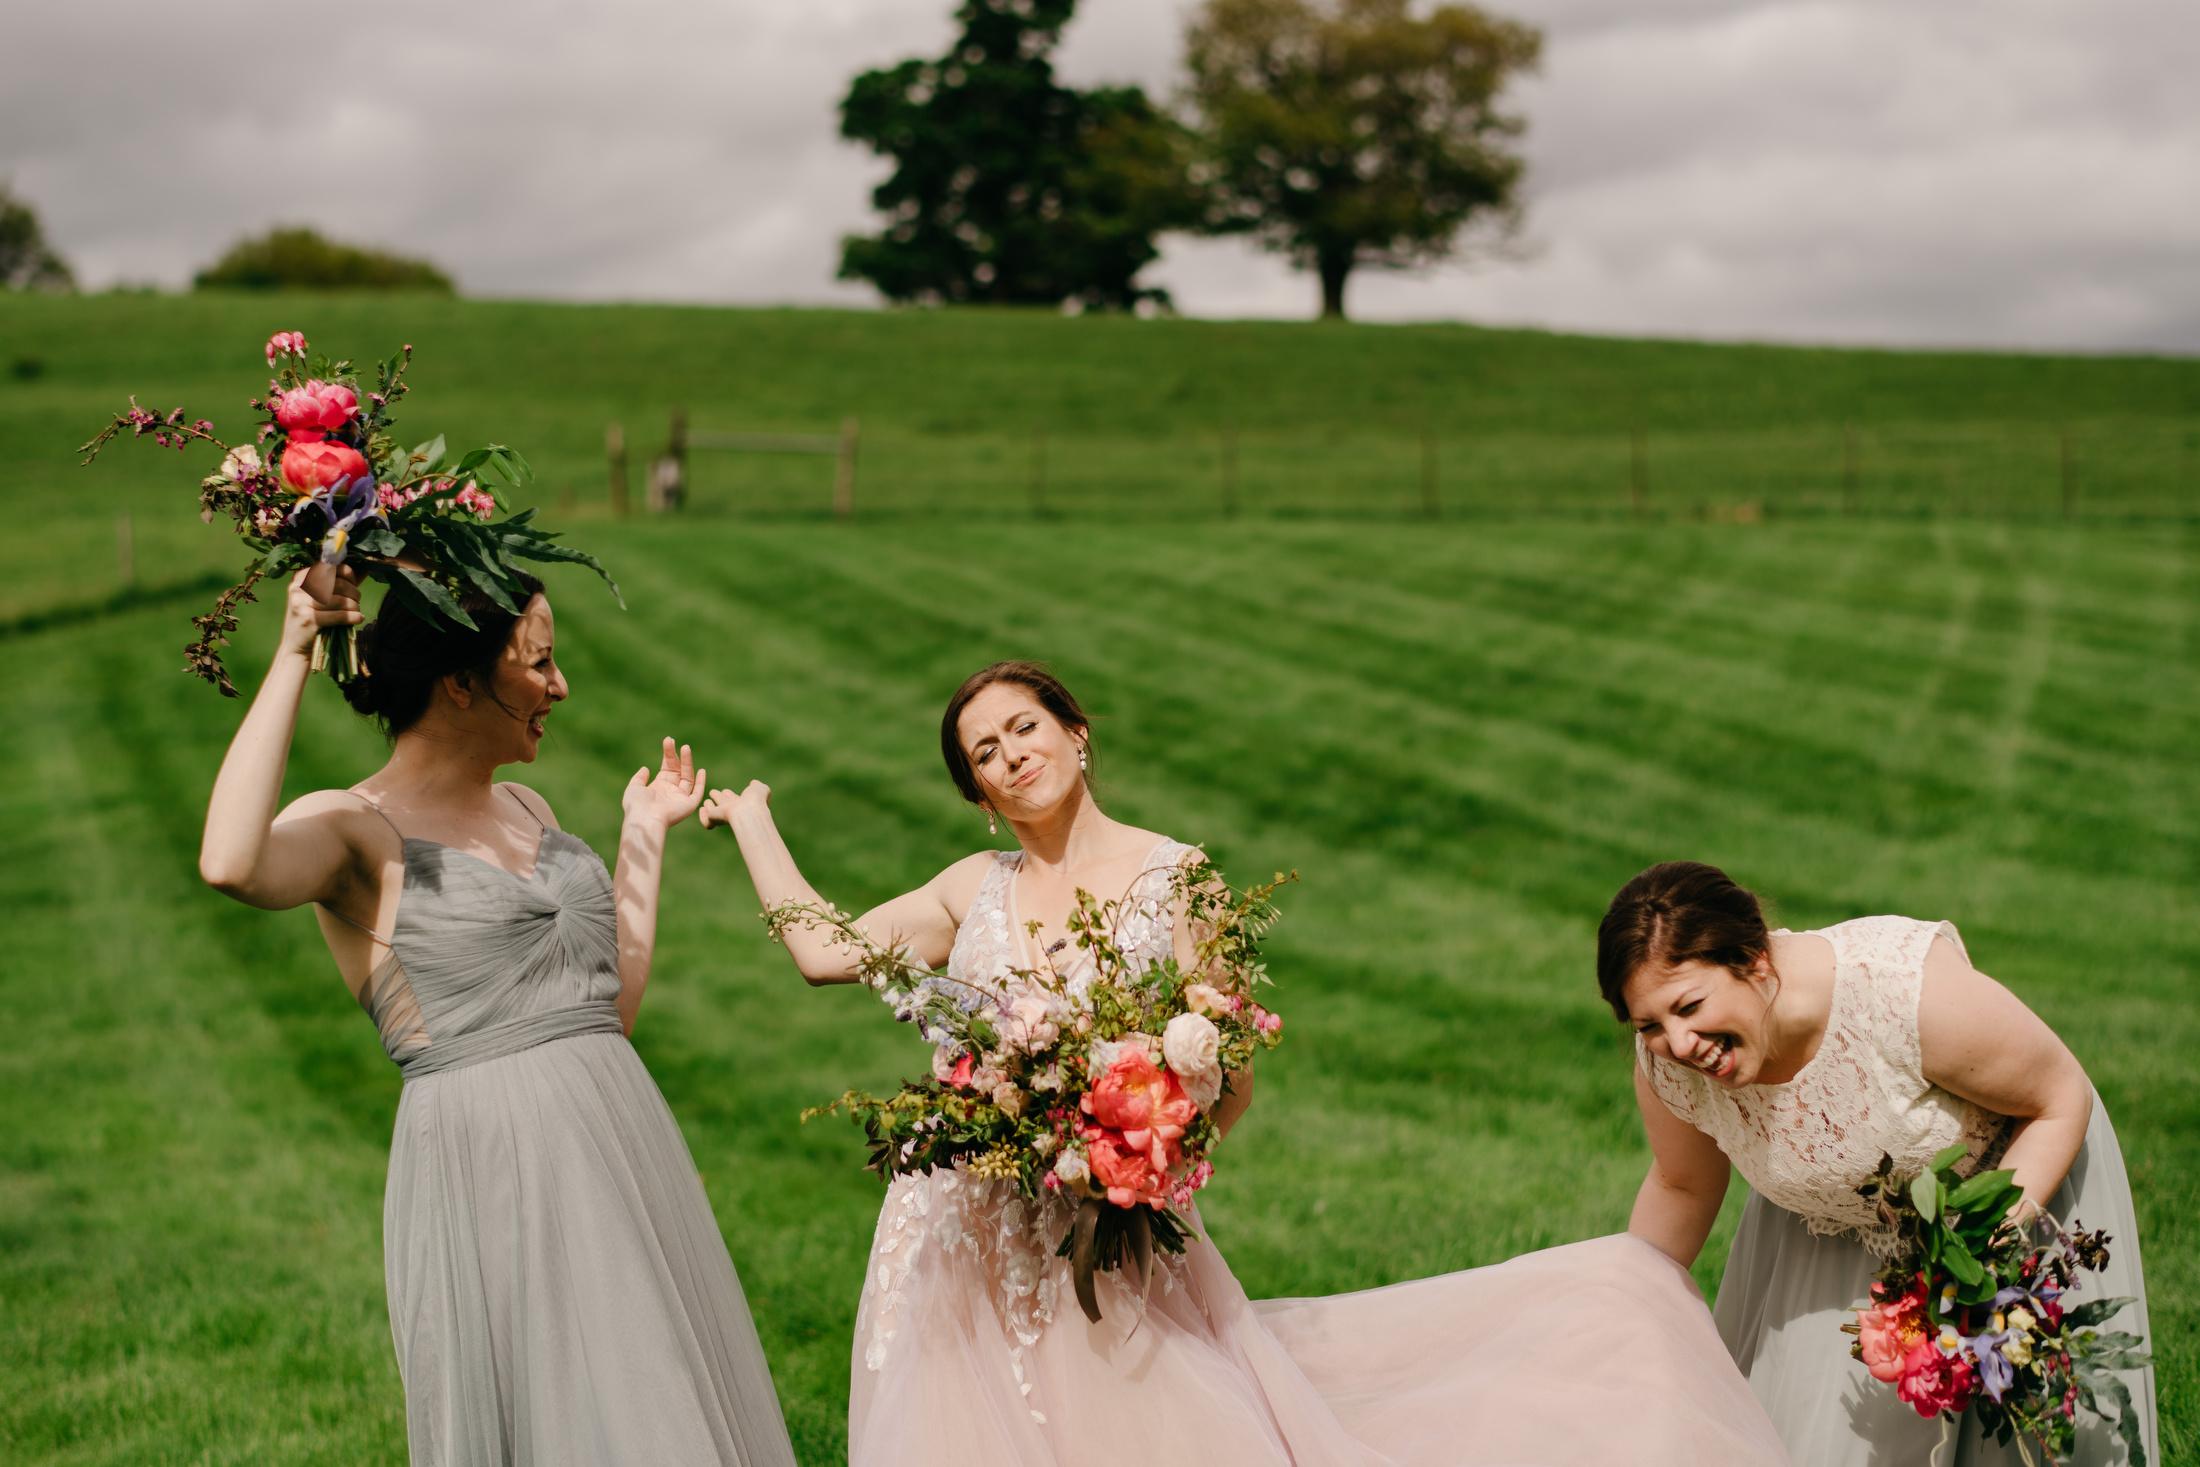 gibbet_hill_barn_same_sex_wedding_photos_30.JPG